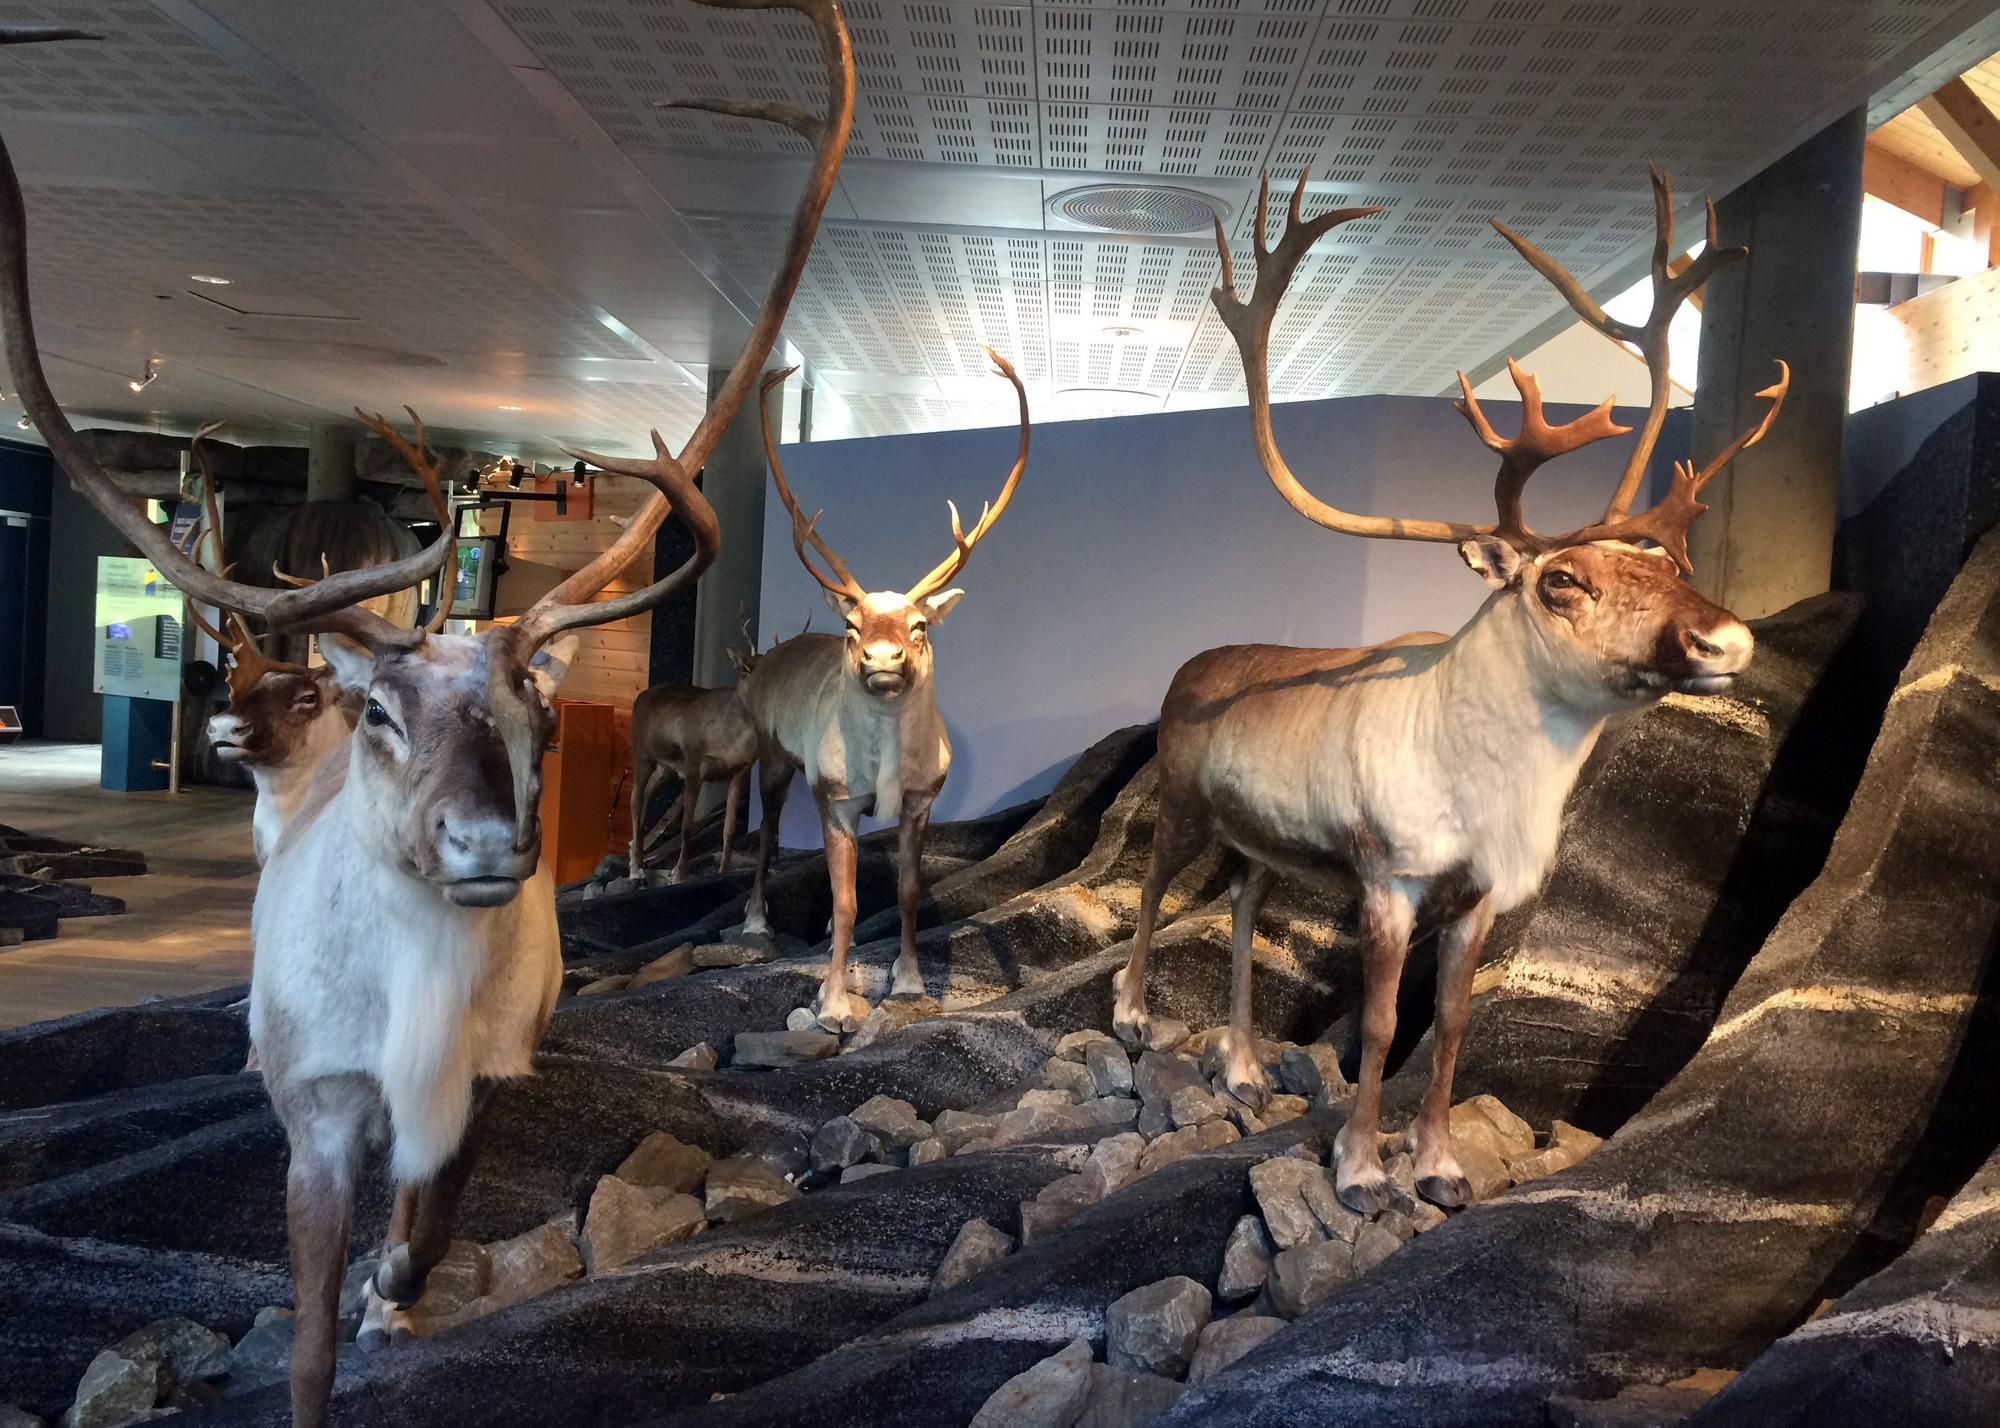 Hardangervidda natursenter